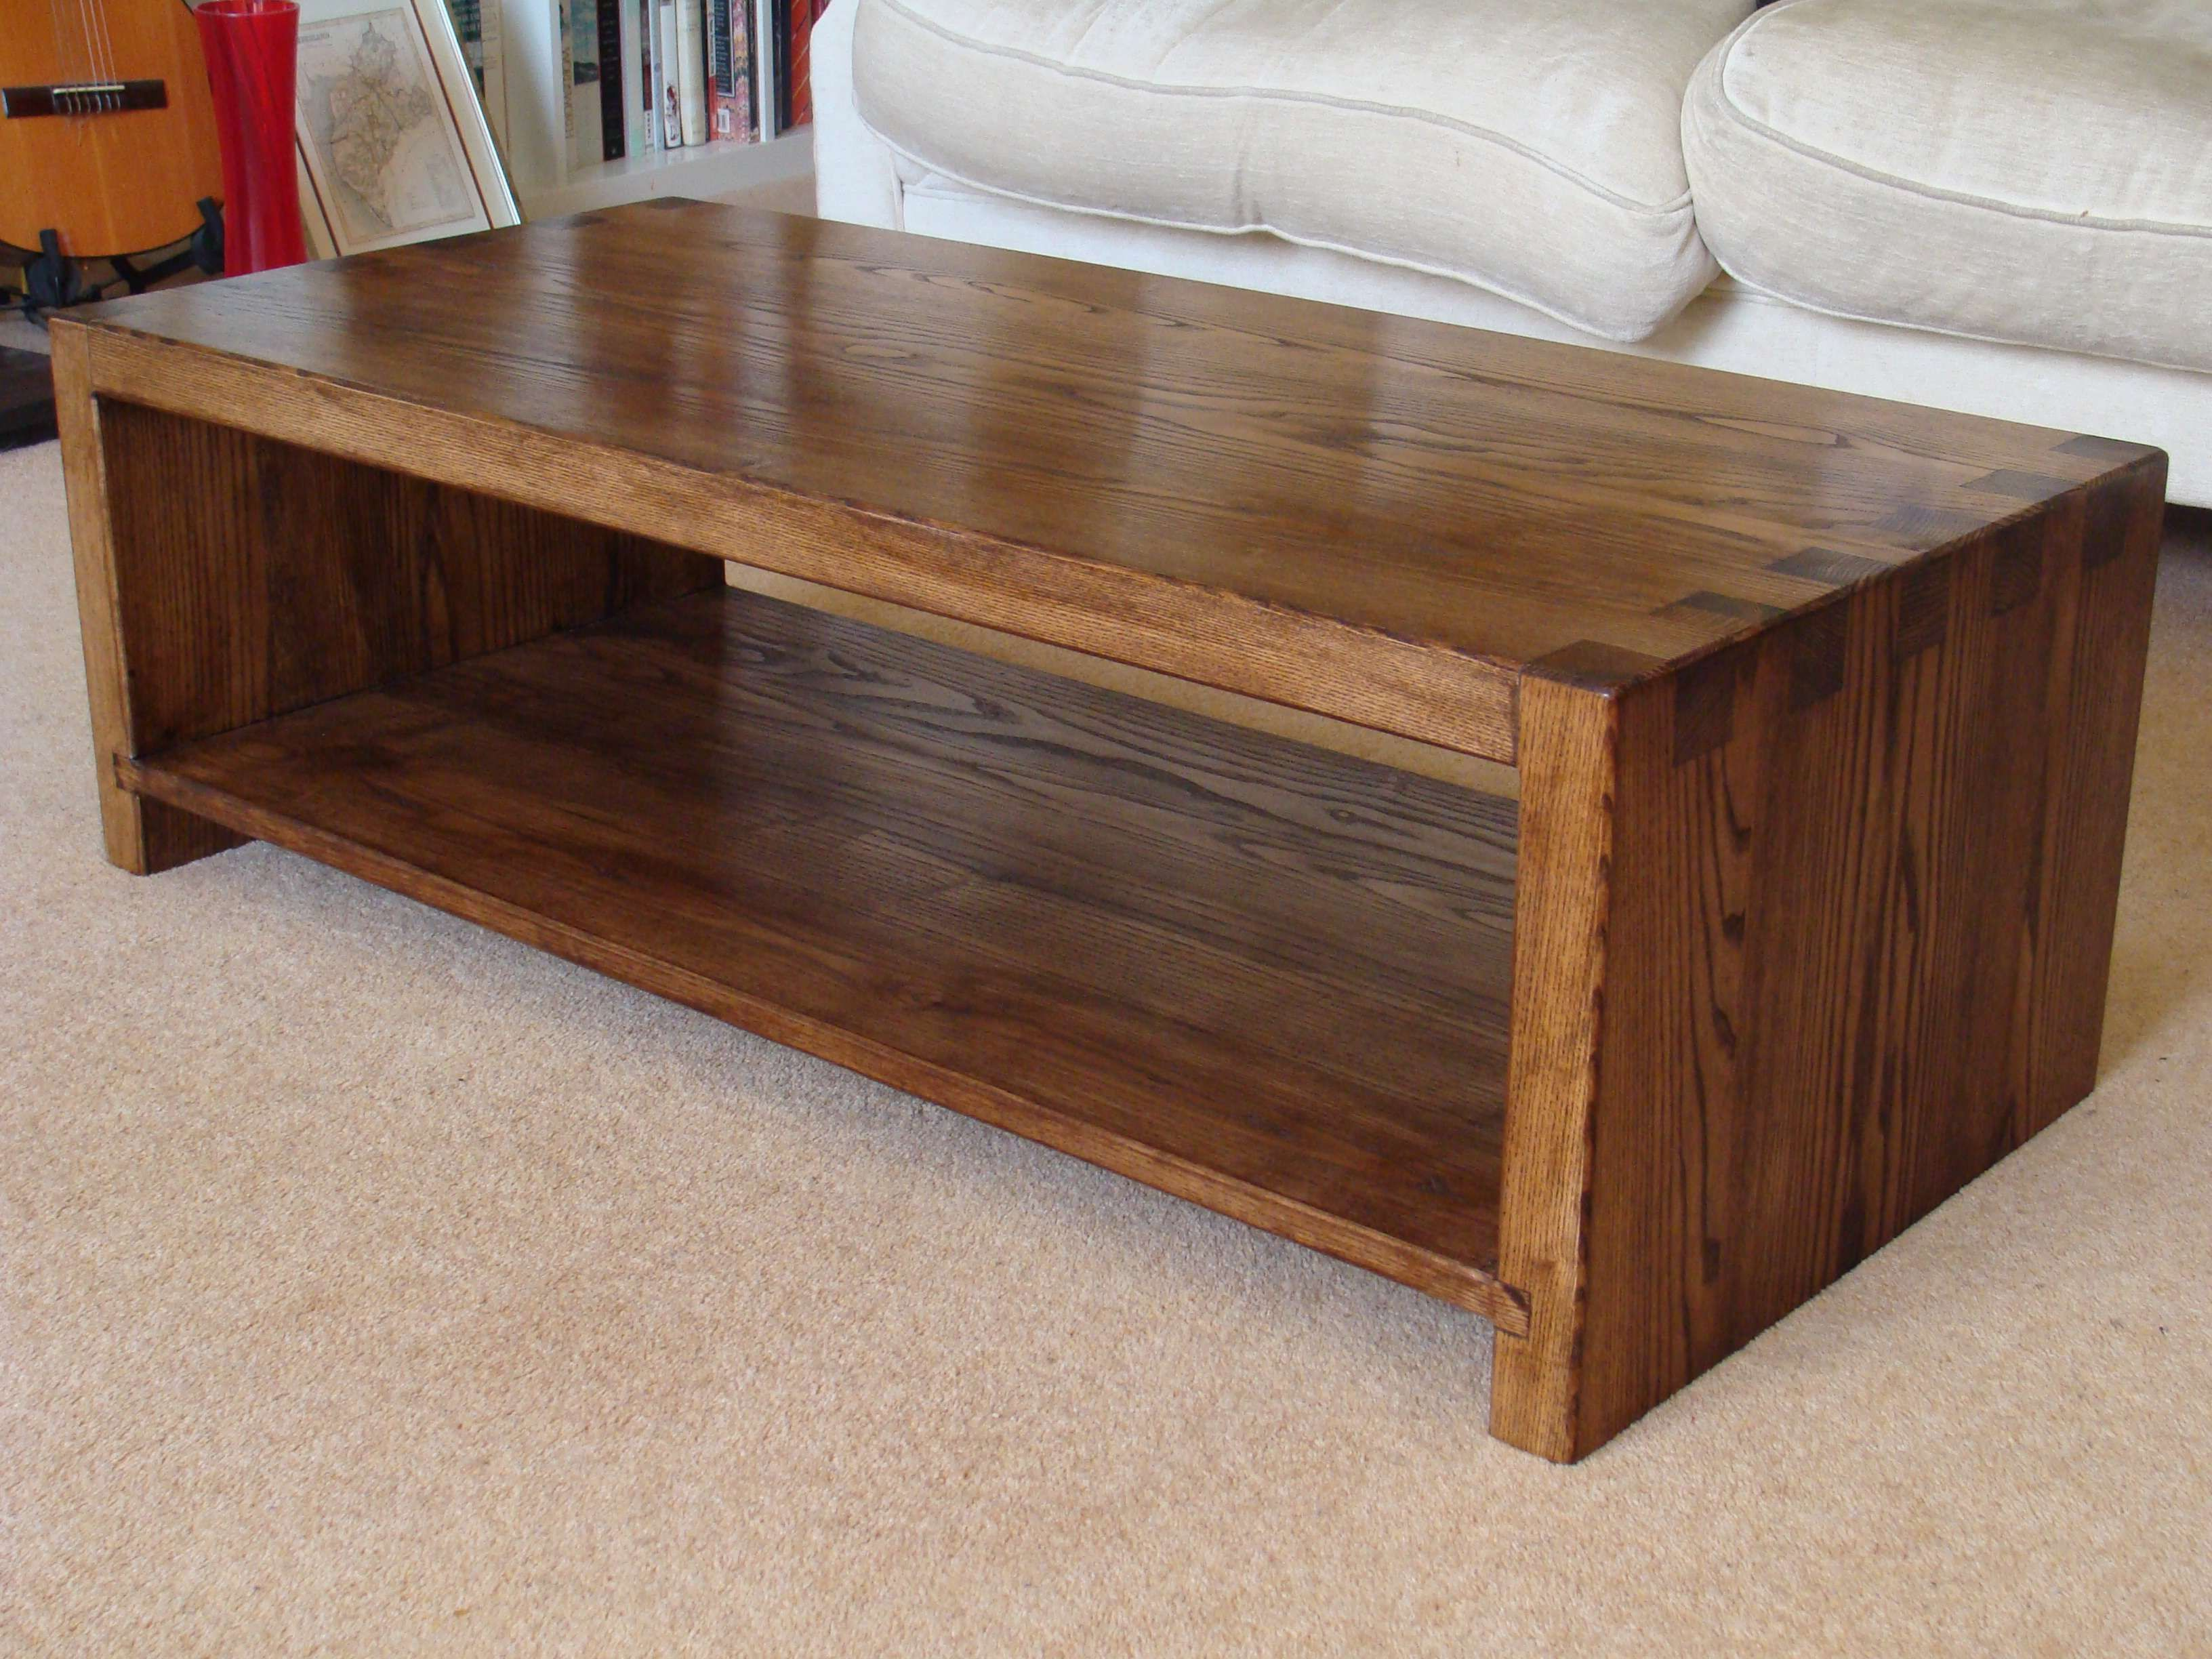 Bespoke Chunky Solid Ash Coffee Table Coffee Table Diy Coffee